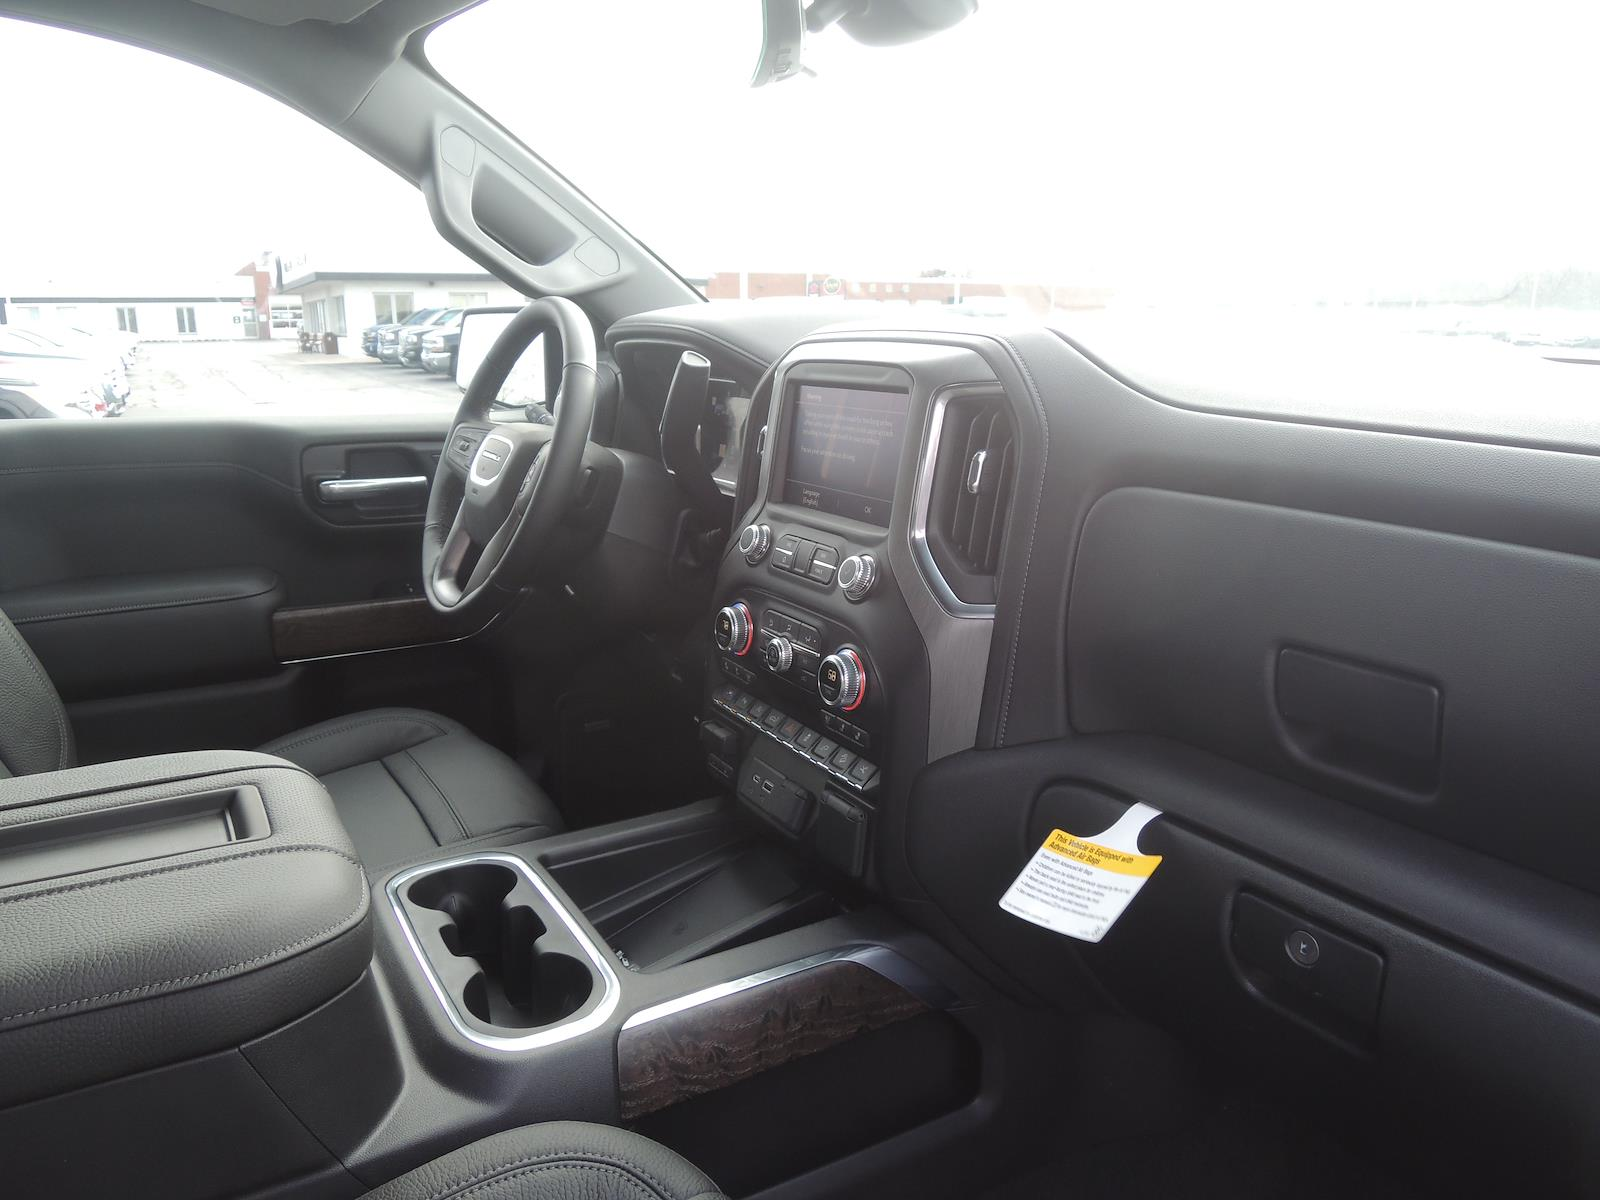 2021 GMC Sierra 1500 Crew Cab 4x4, Pickup #MT434 - photo 16